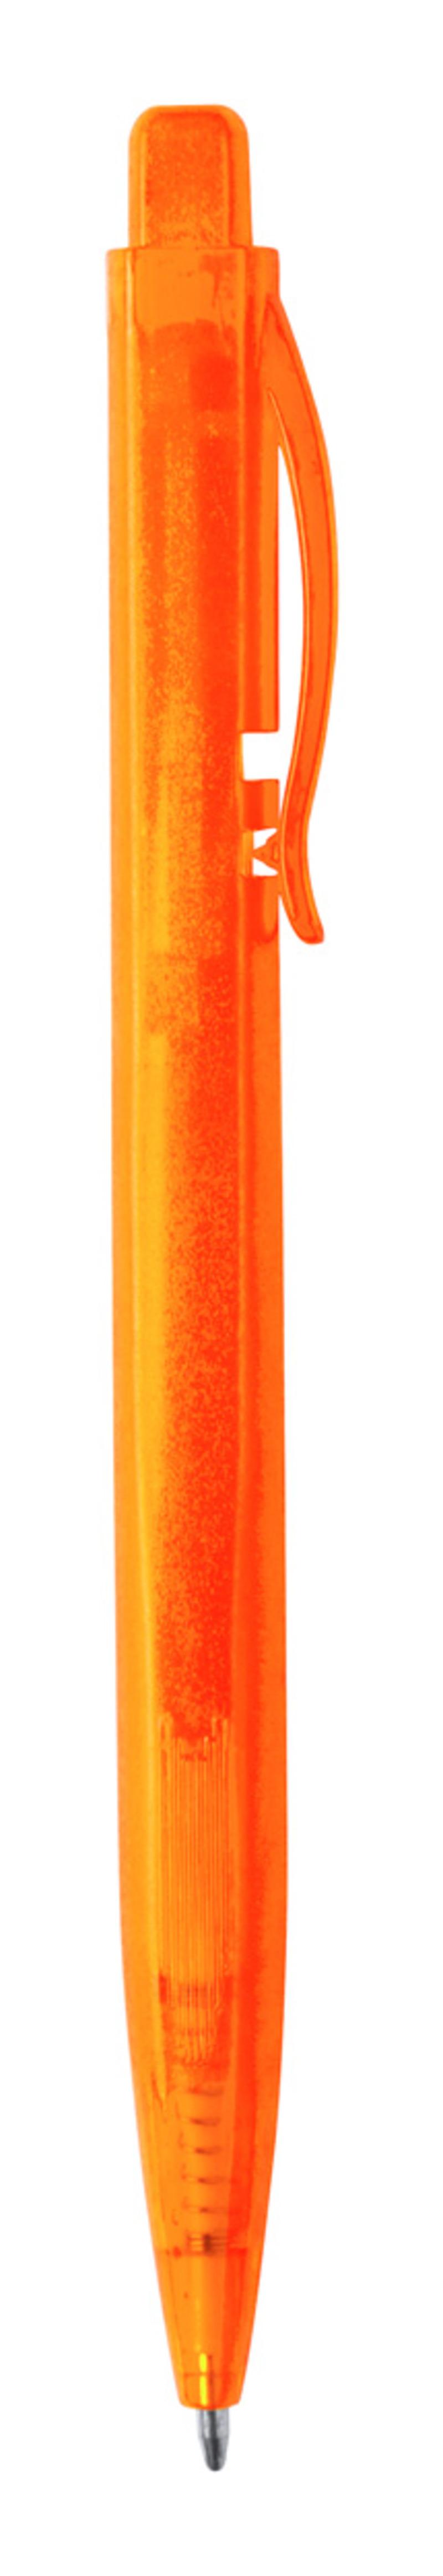 Dafnel ballpoint pen